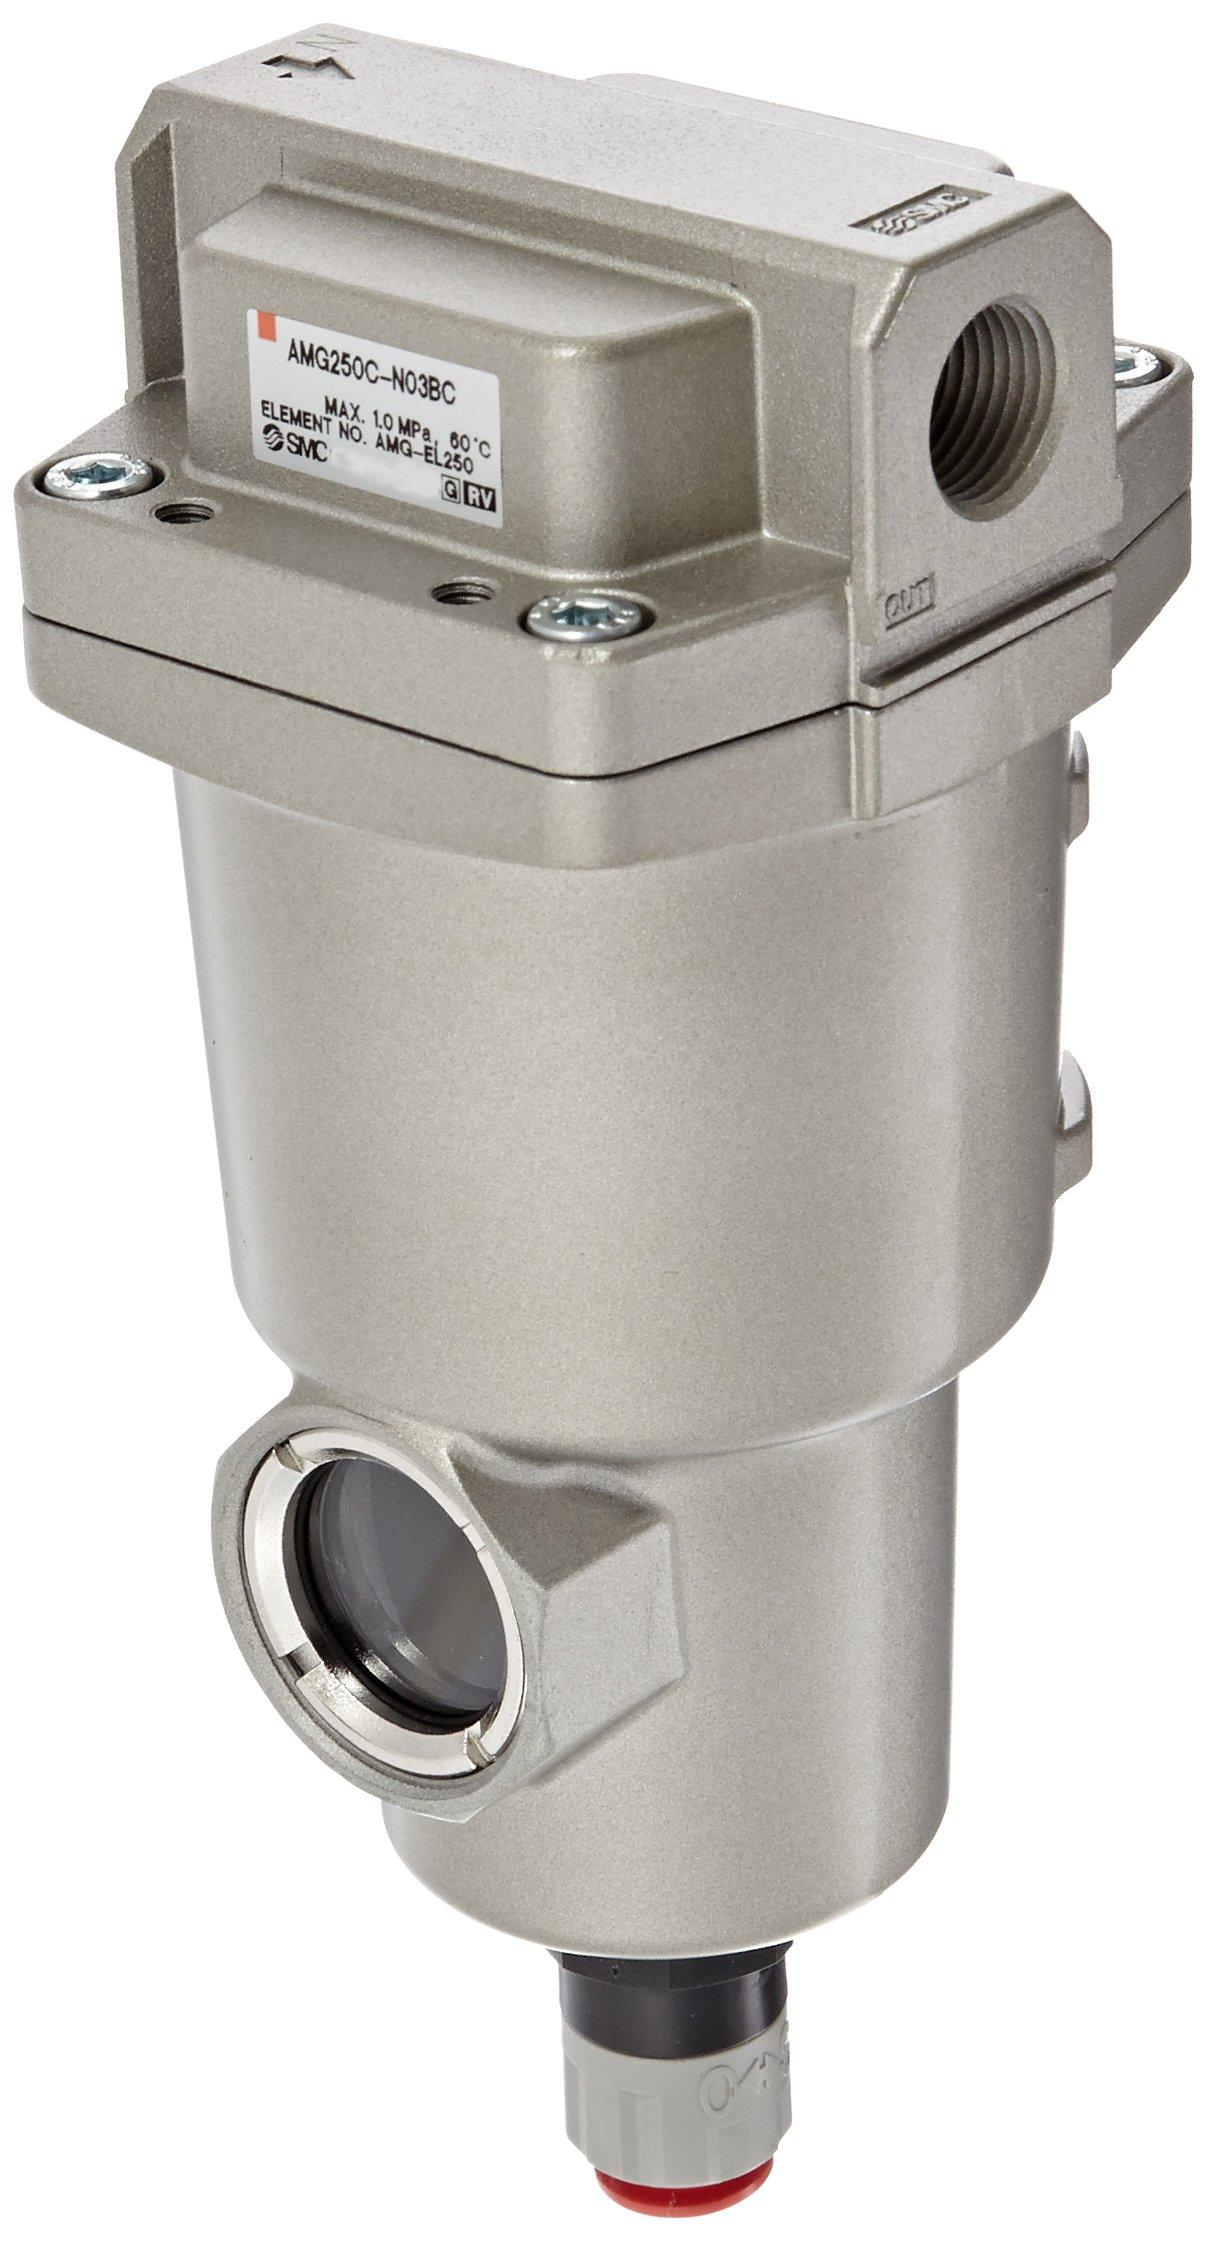 SMC AMG250C-N03BC Water Separator, N.C. Auto Drain, 750 L/min, 3/8'' NPT, Mounting Bracket by SMC